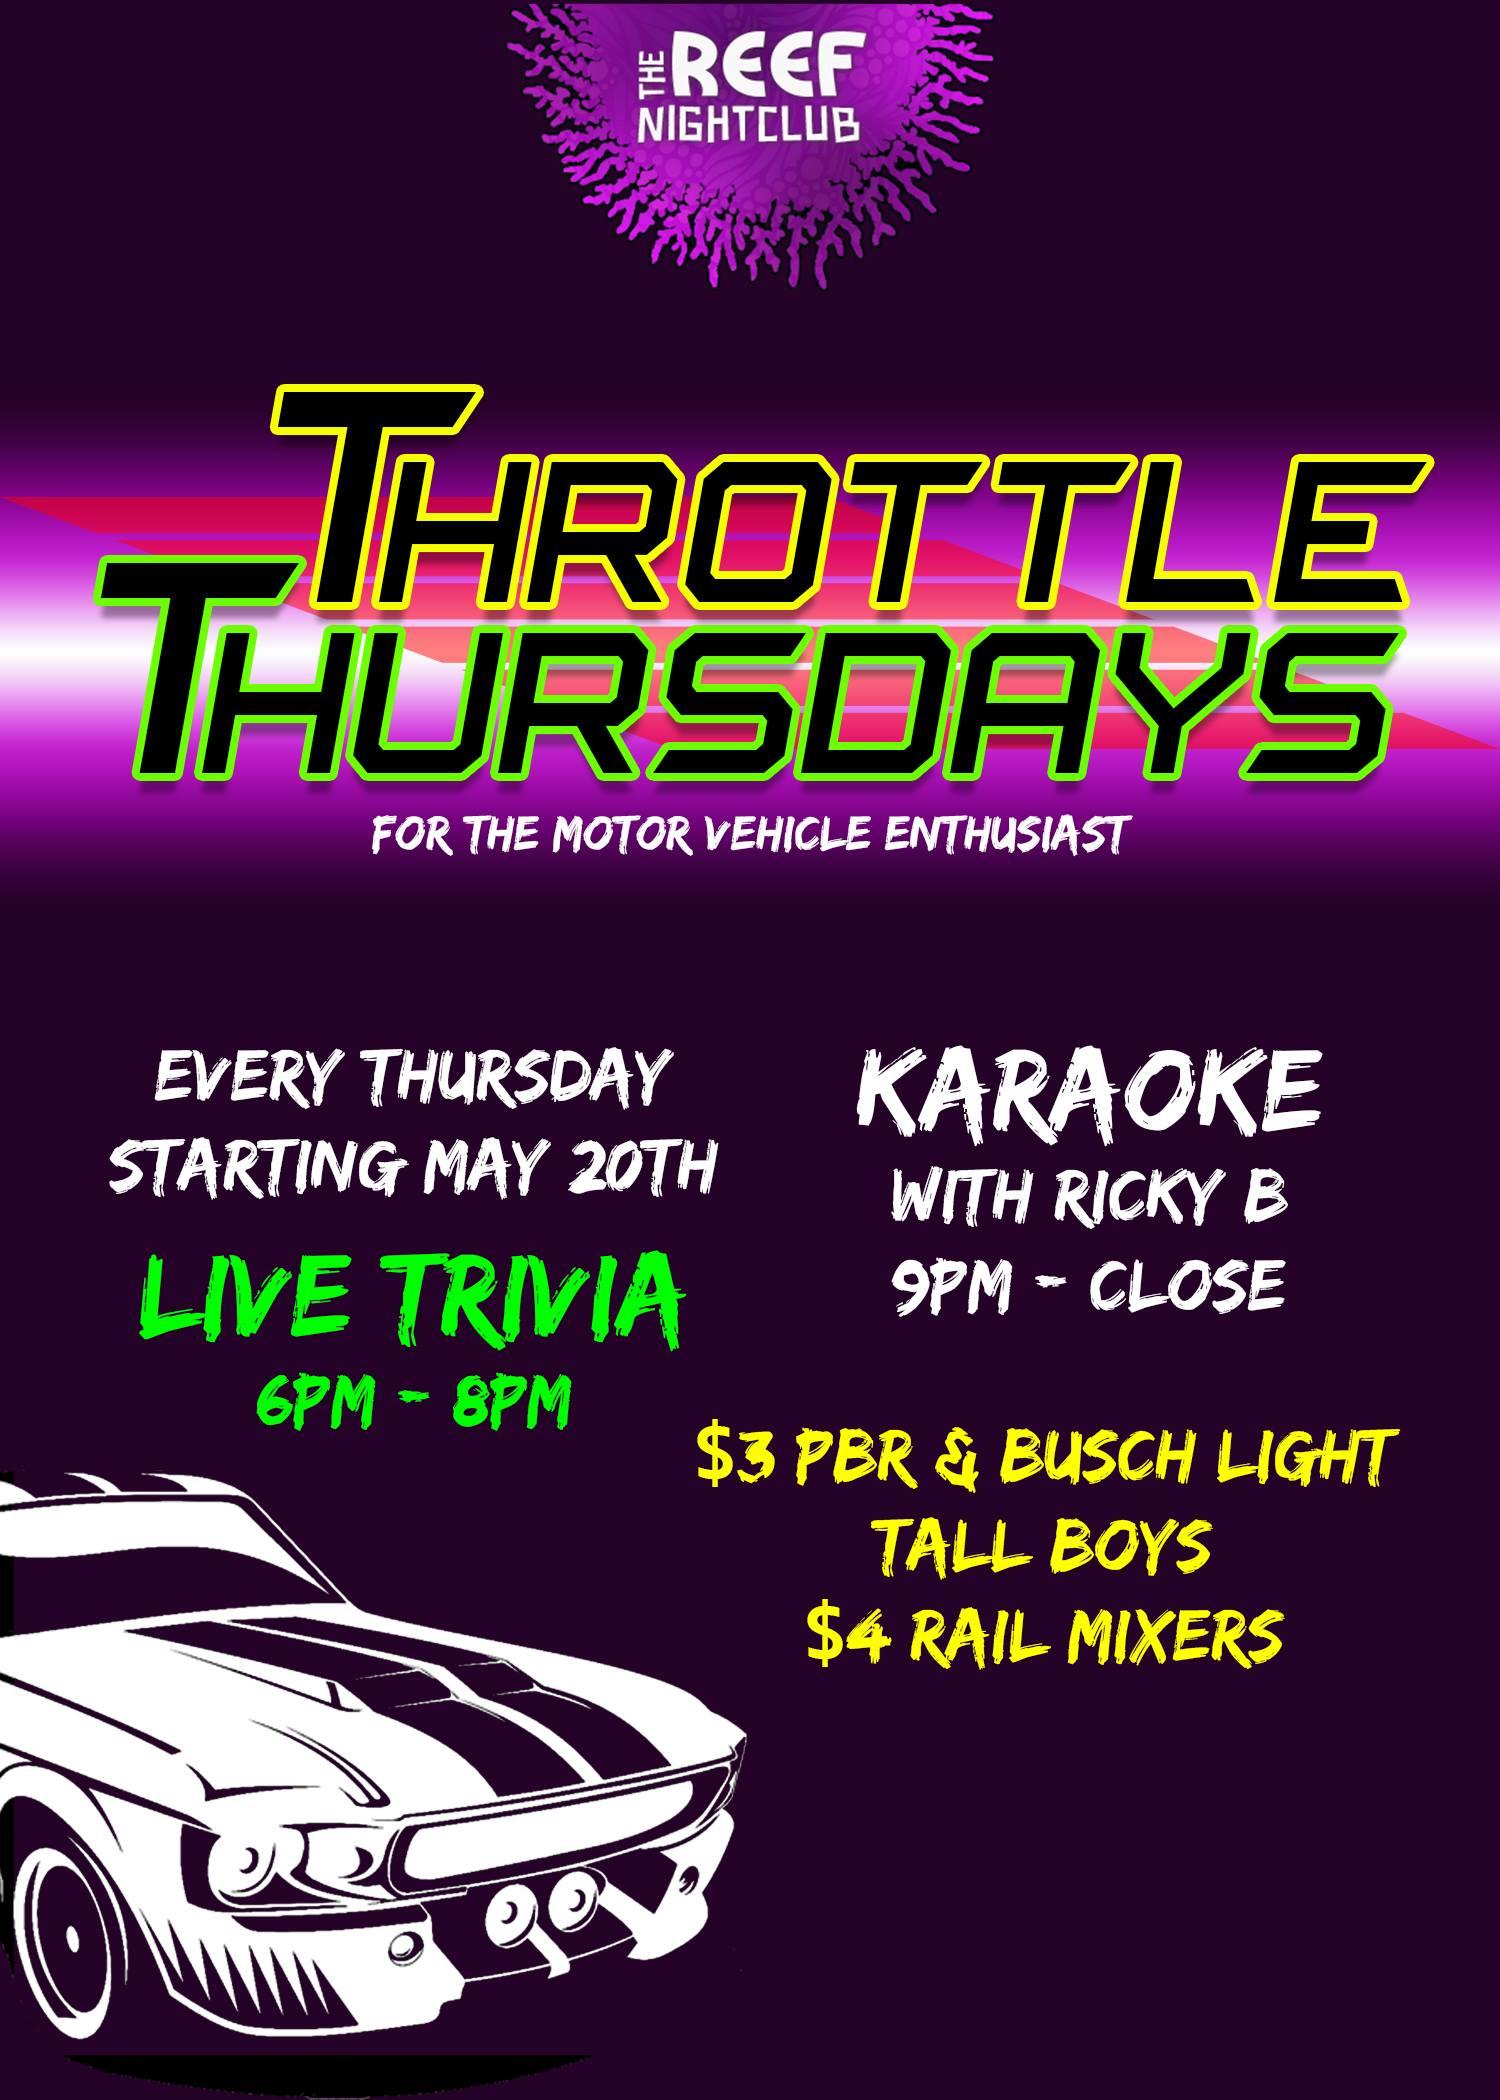 The Reef Night Club Throttle Thursday